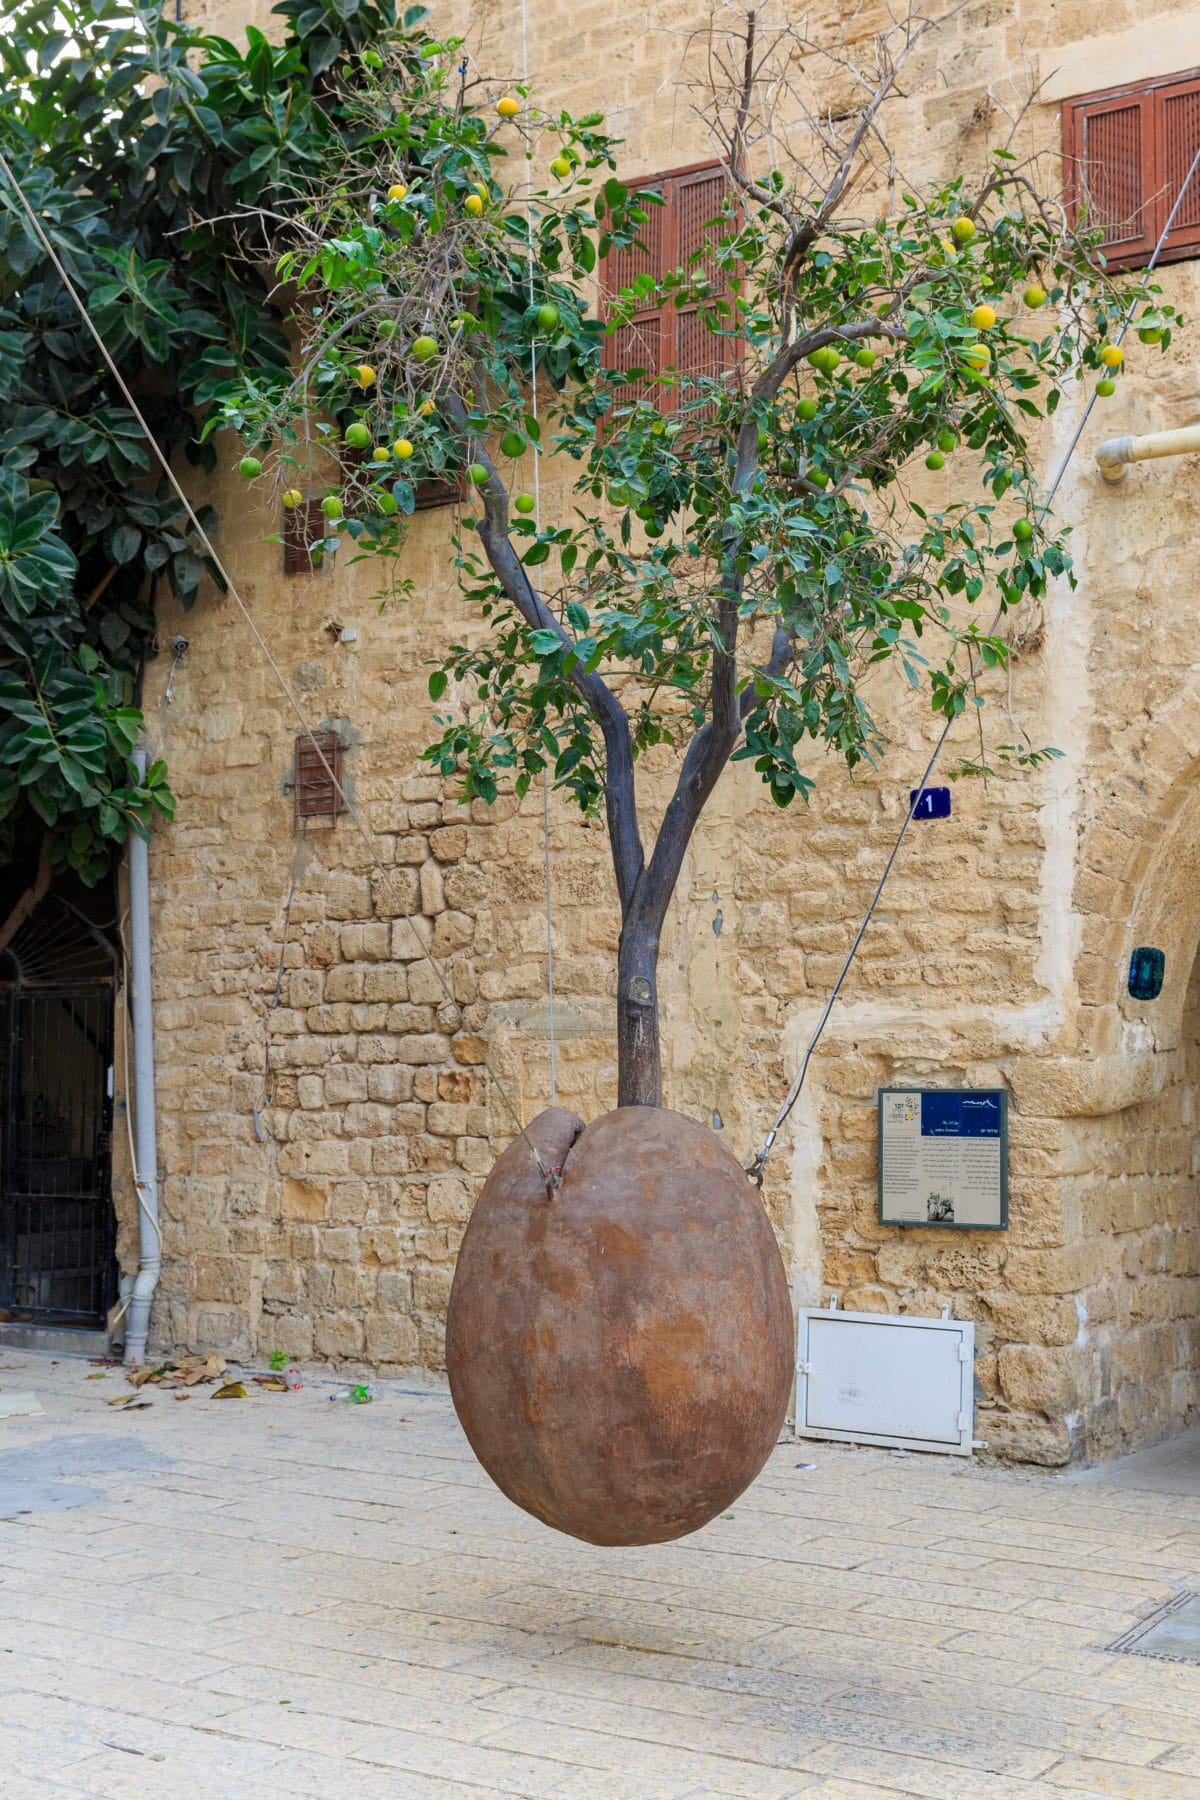 Israel-kontrasternes-land-felecool - AdobeStock_129116230.jpeg